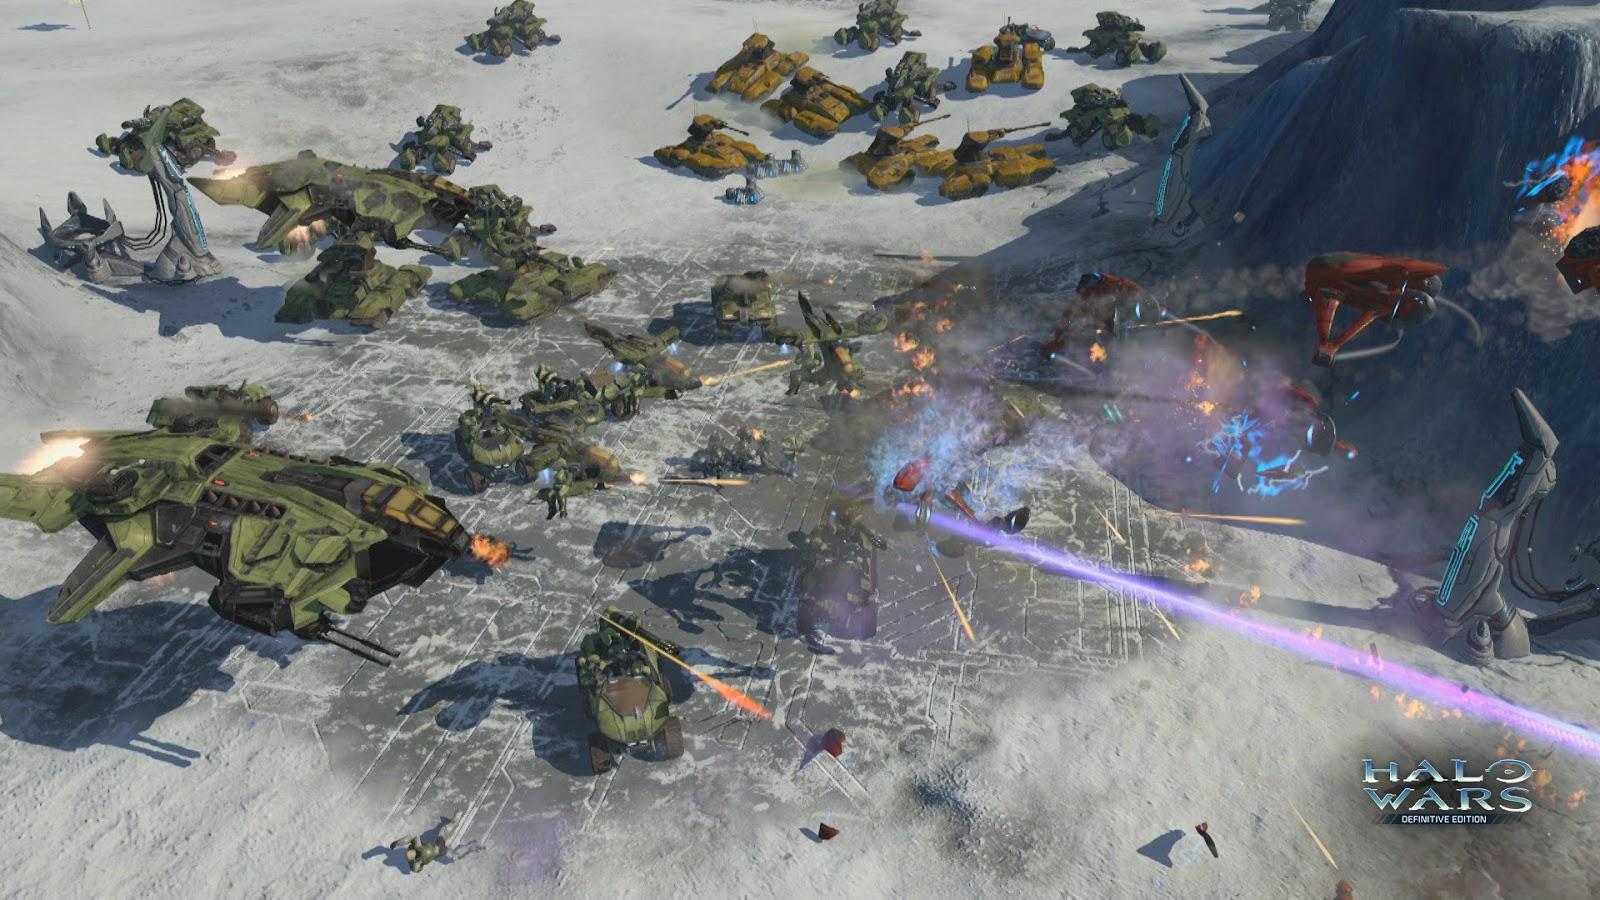 Halo Wars Definitive Edition ESPAÑOL PC Full + Hotfix 2 (CODEX) + REPACK 2 DVD5 (JPW) 4